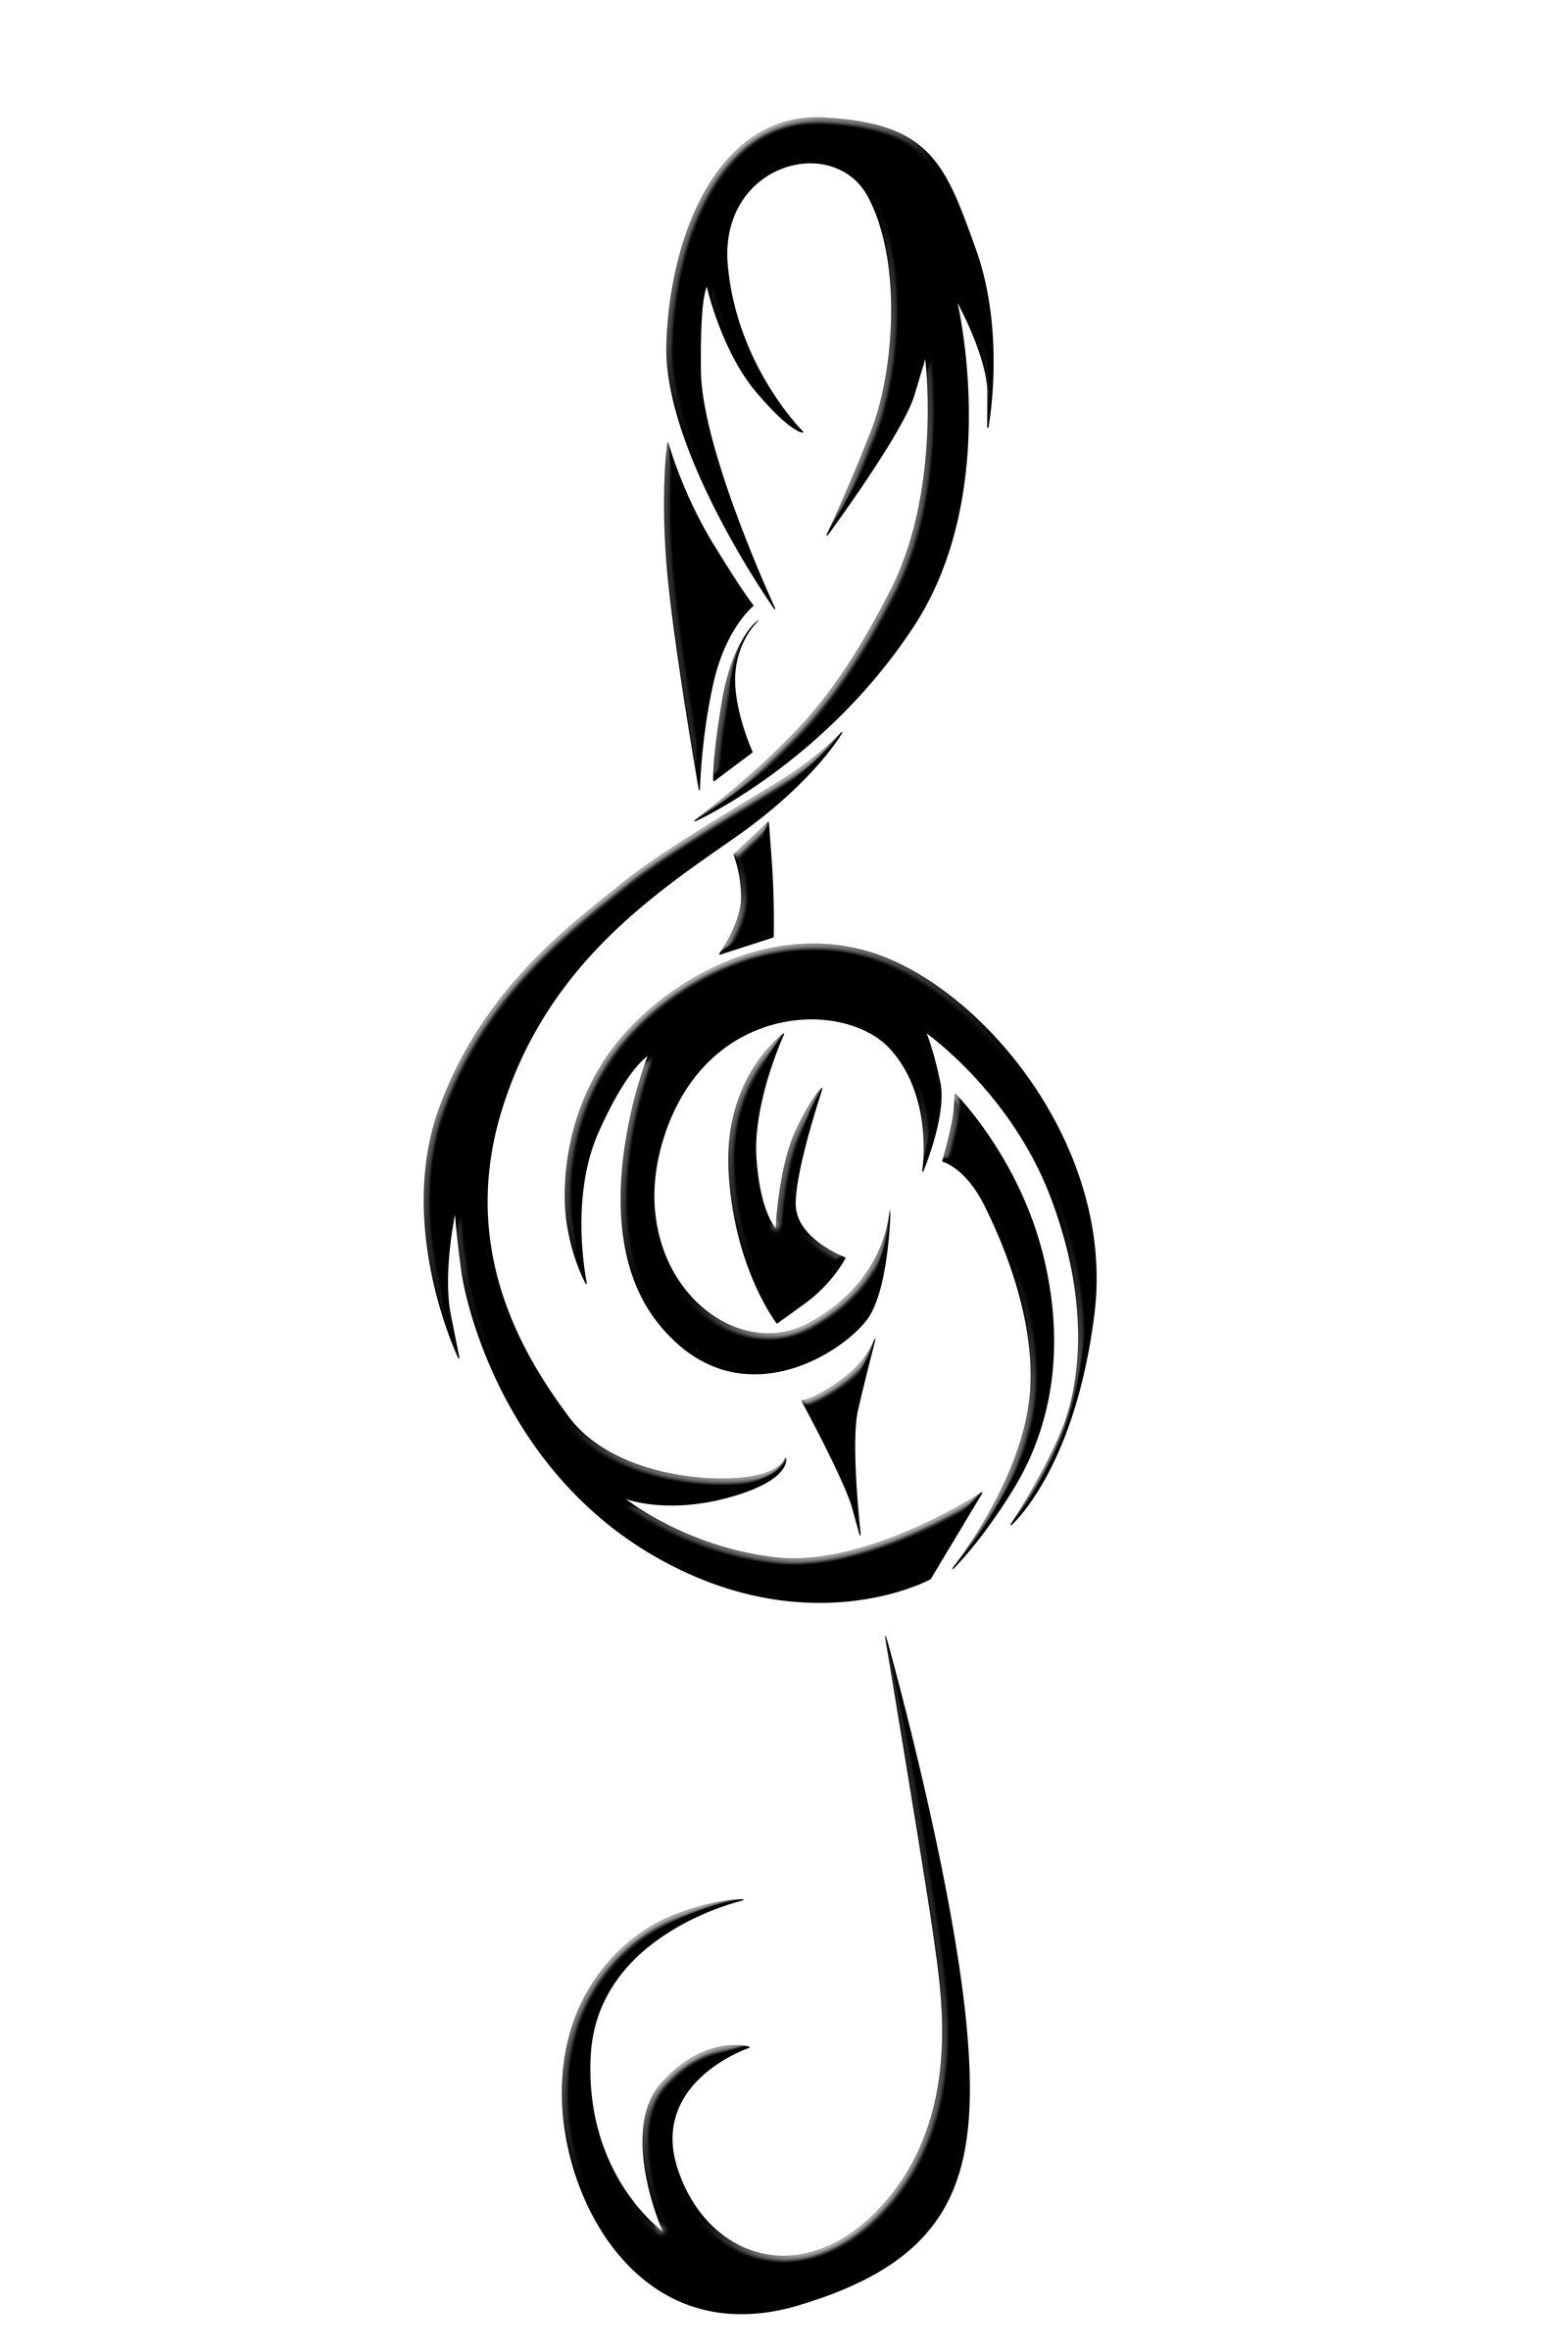 treble clef vector art clipart best tattoo art pinterest rh pinterest com treble clef clipart treble clef clipart no background